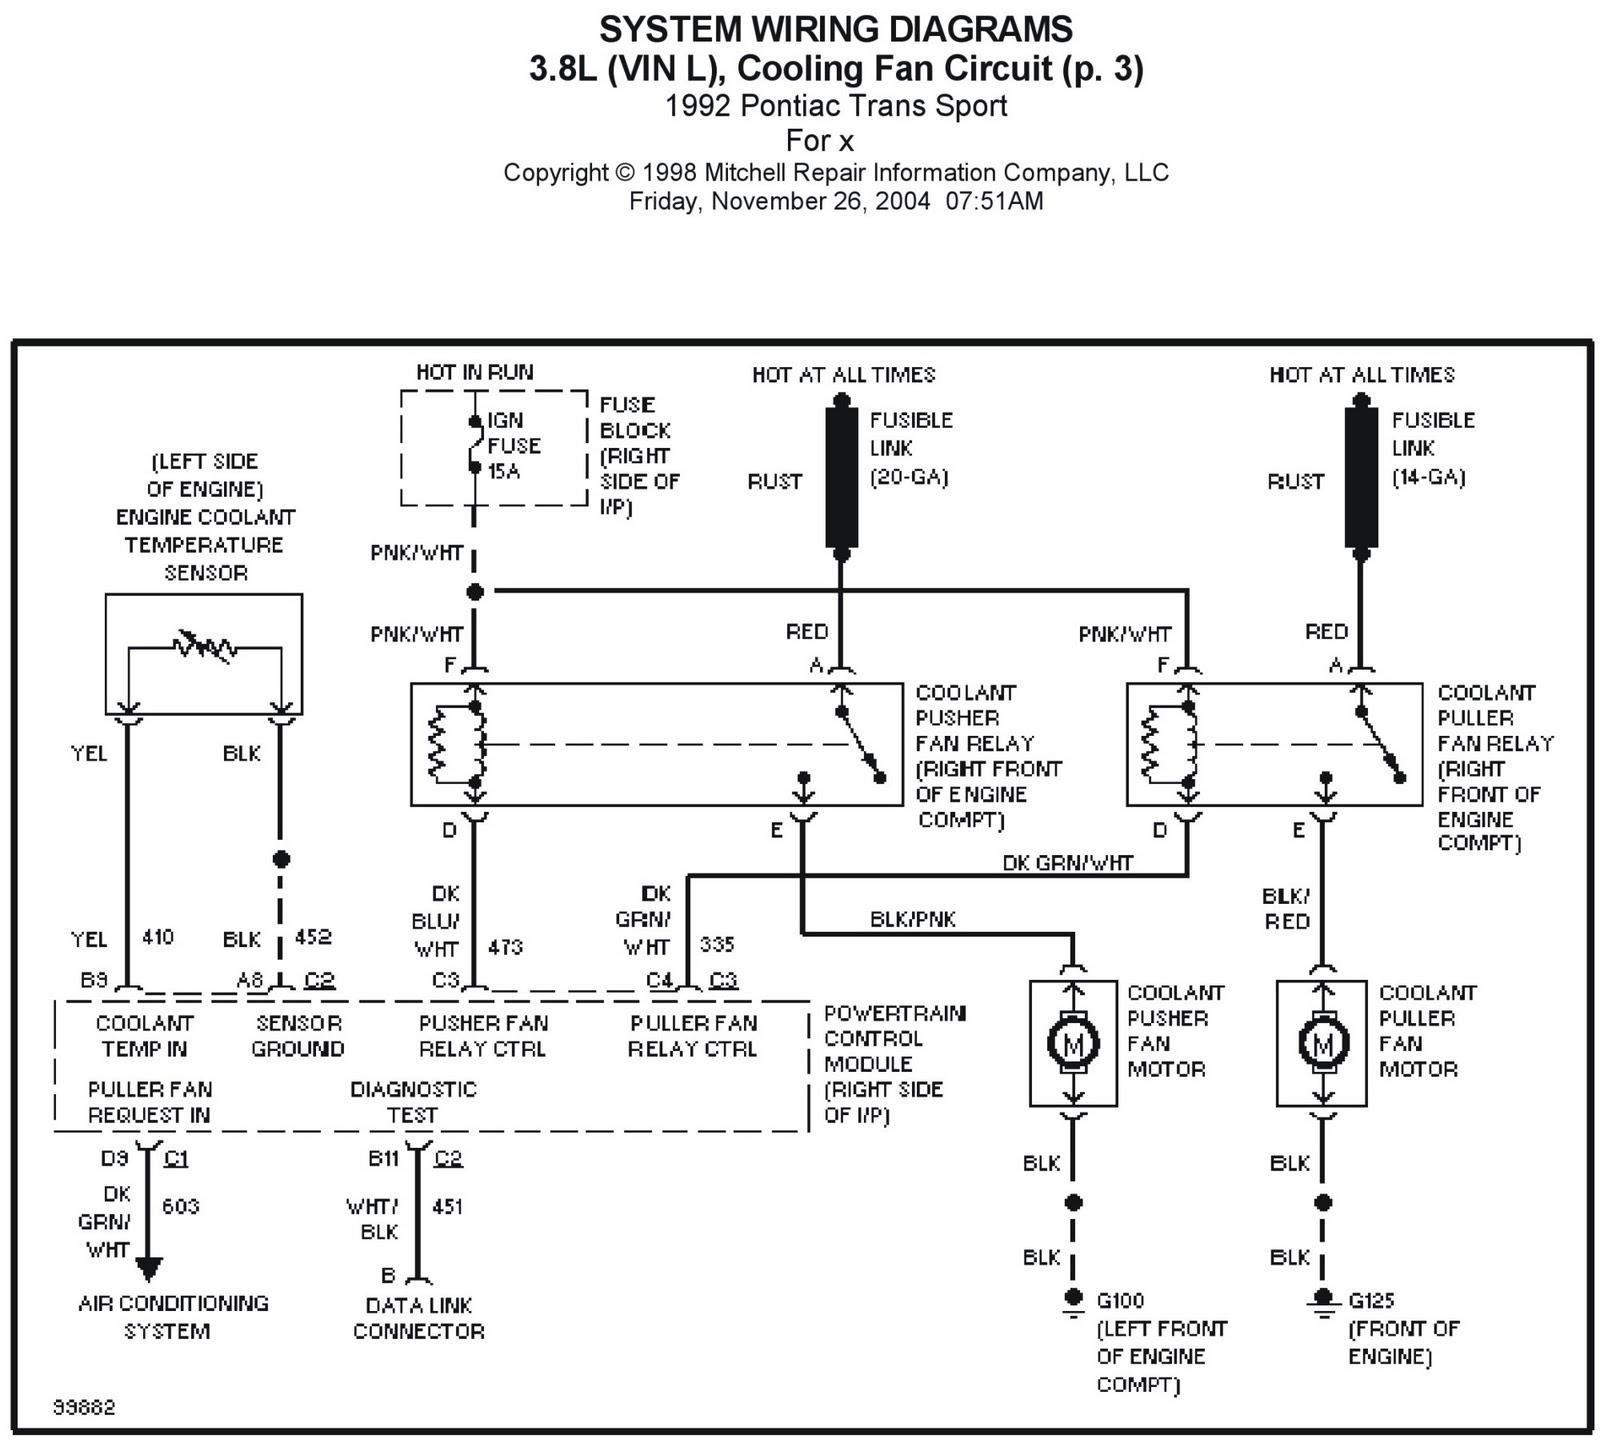 wiring diagram 1997 pontiac transport premium wiring diagram designcircuit and wiring diagram pontiac trans sport wiring [ 1600 x 1443 Pixel ]